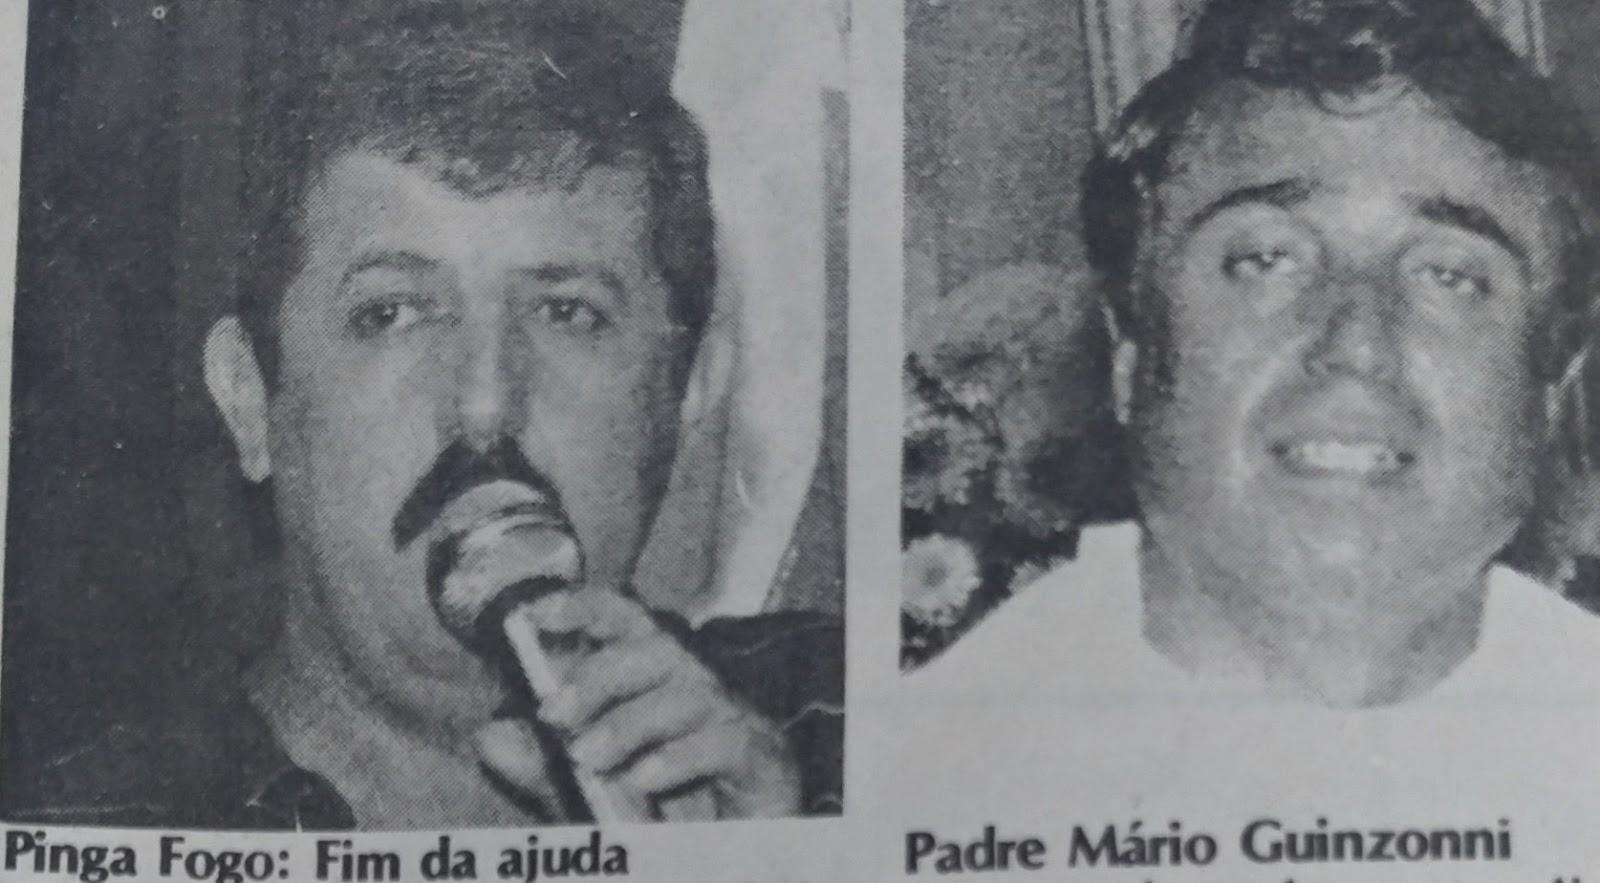 Pinga Fogo x padre Mário Guinzonni - 1988